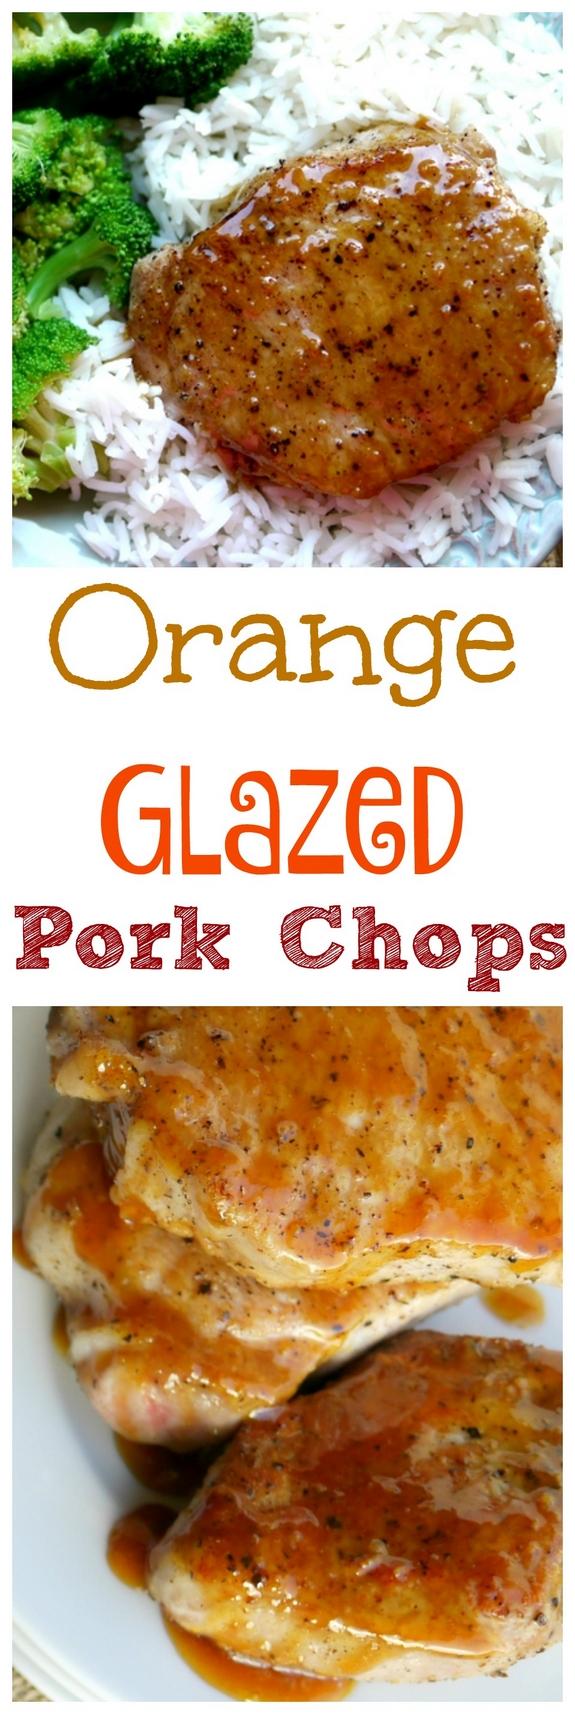 Orange Glazed Pork Chops For The Win